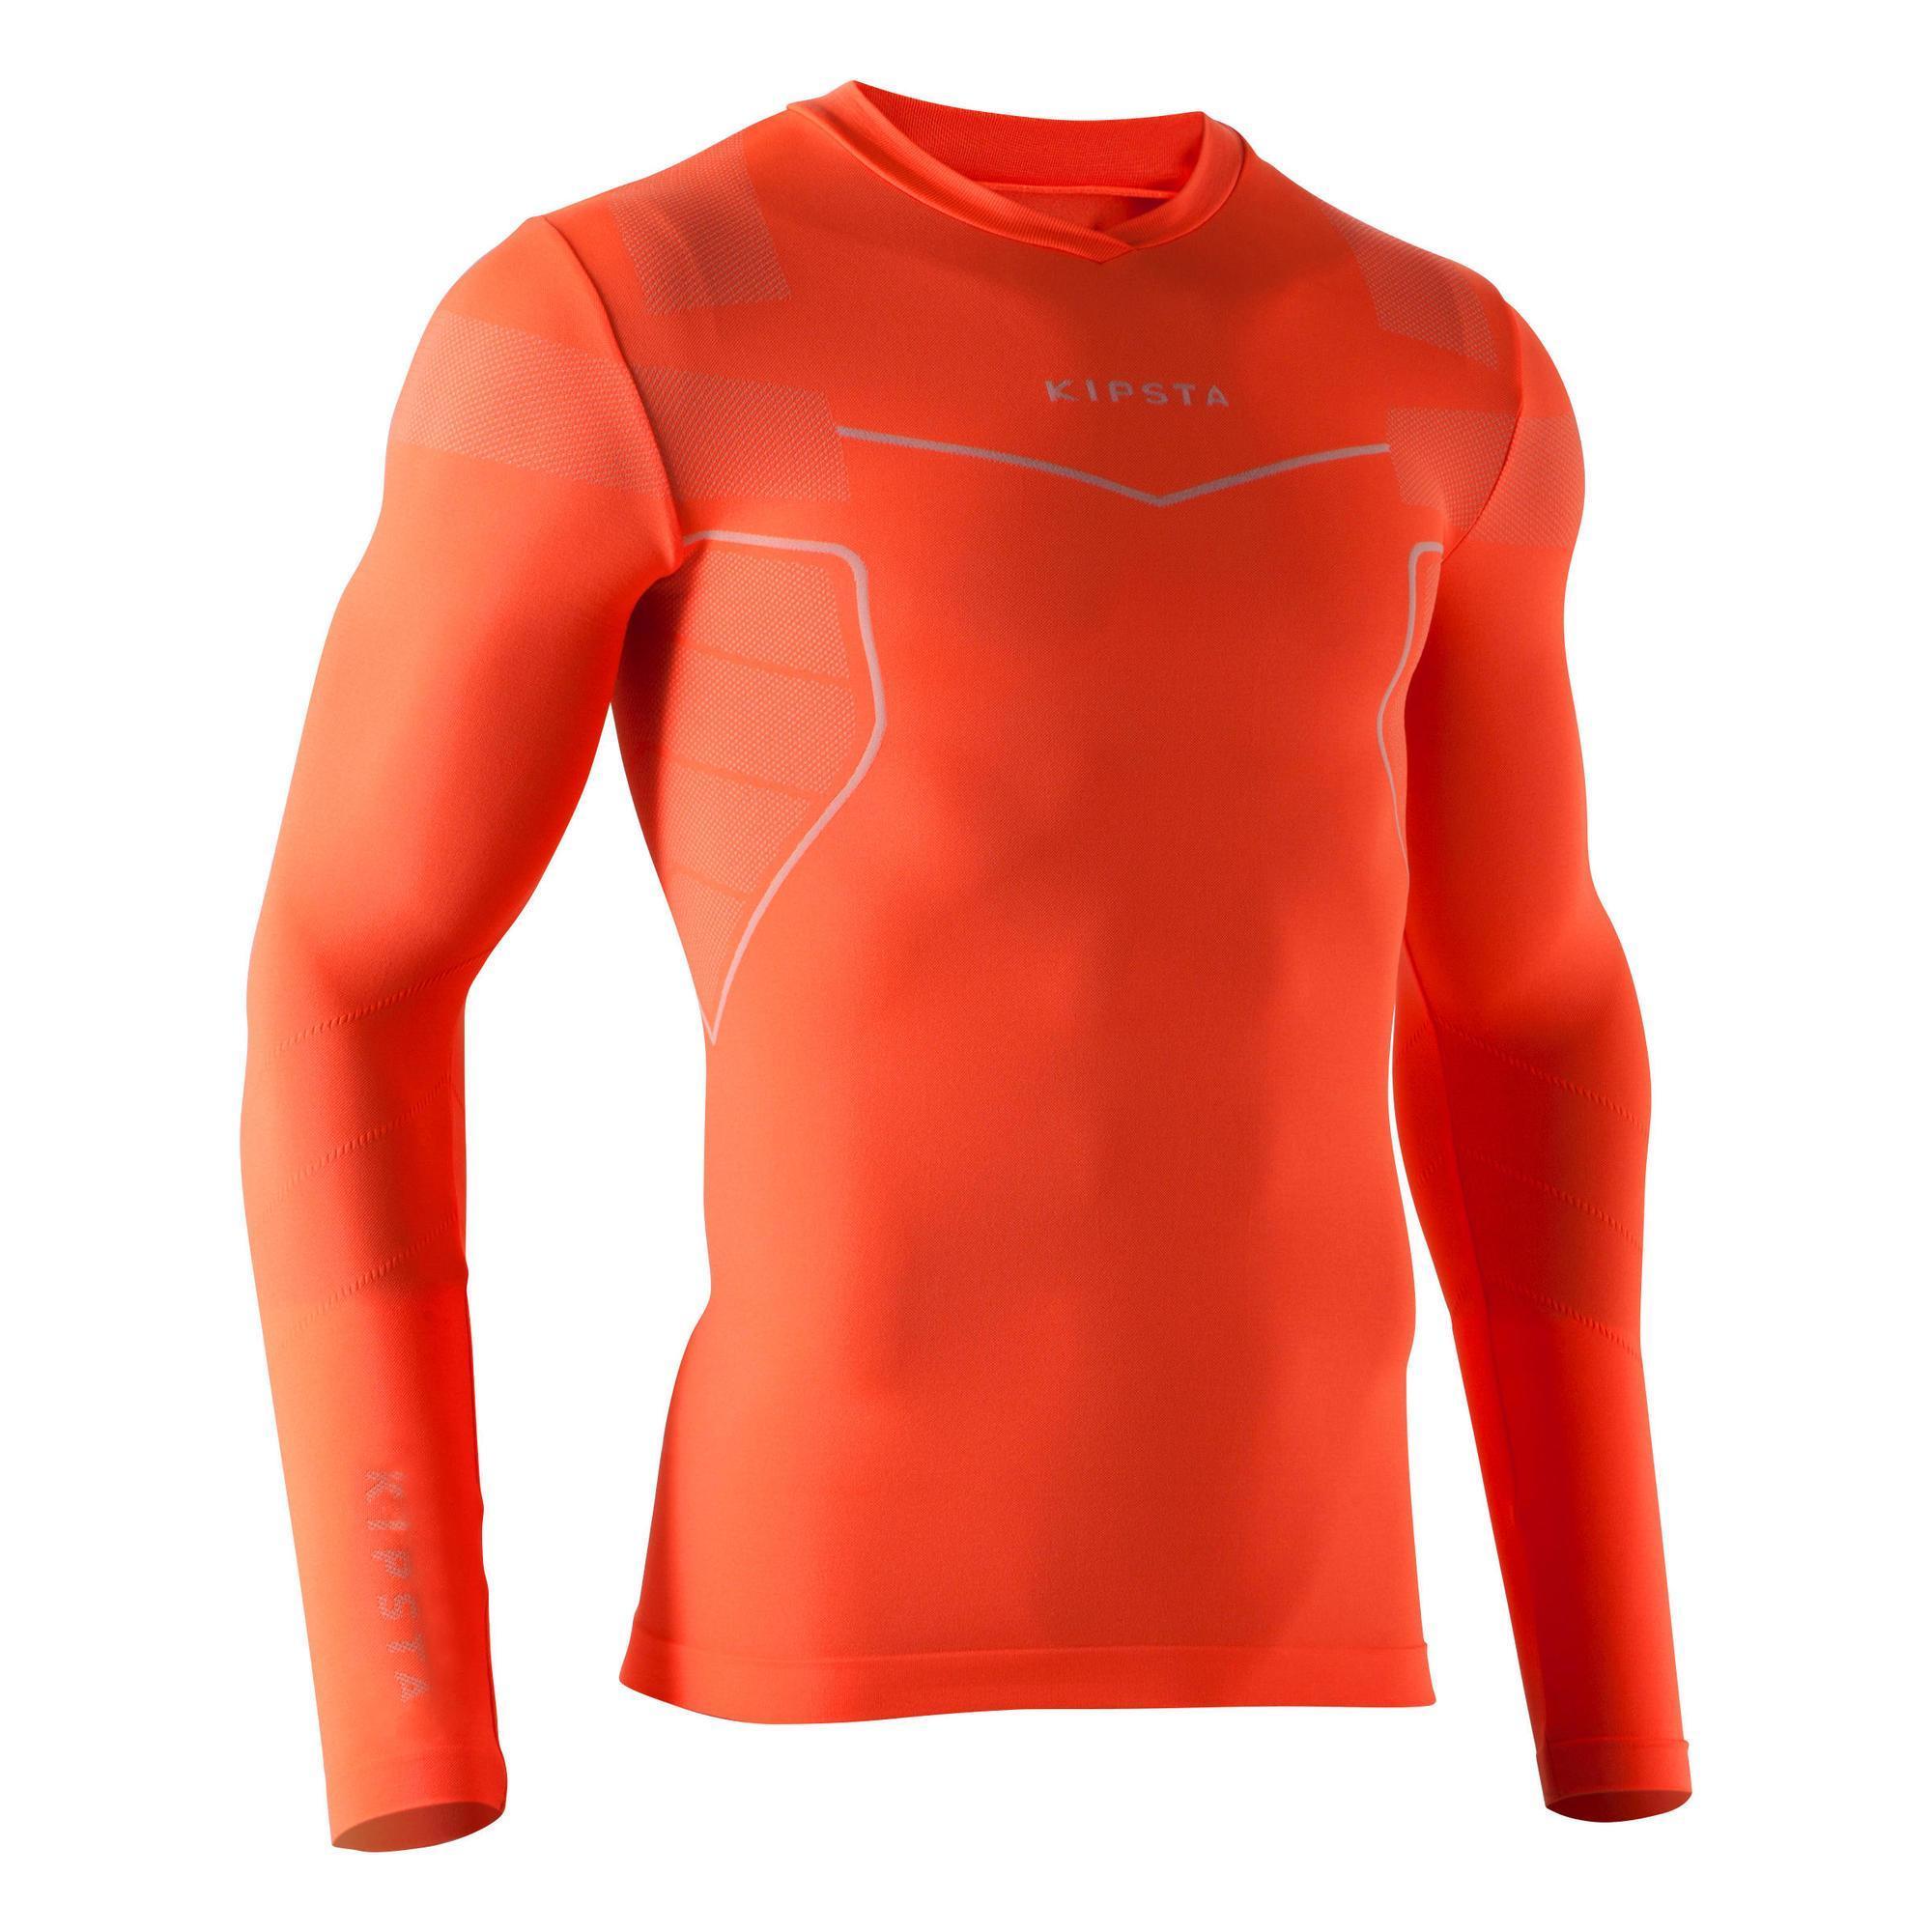 Funktionsshirt Keepdry 500 atmungsaktiv Erwachsene neonorange | Bekleidung > Shirts > Funktionsshirts | Rot - Orange | Kipsta